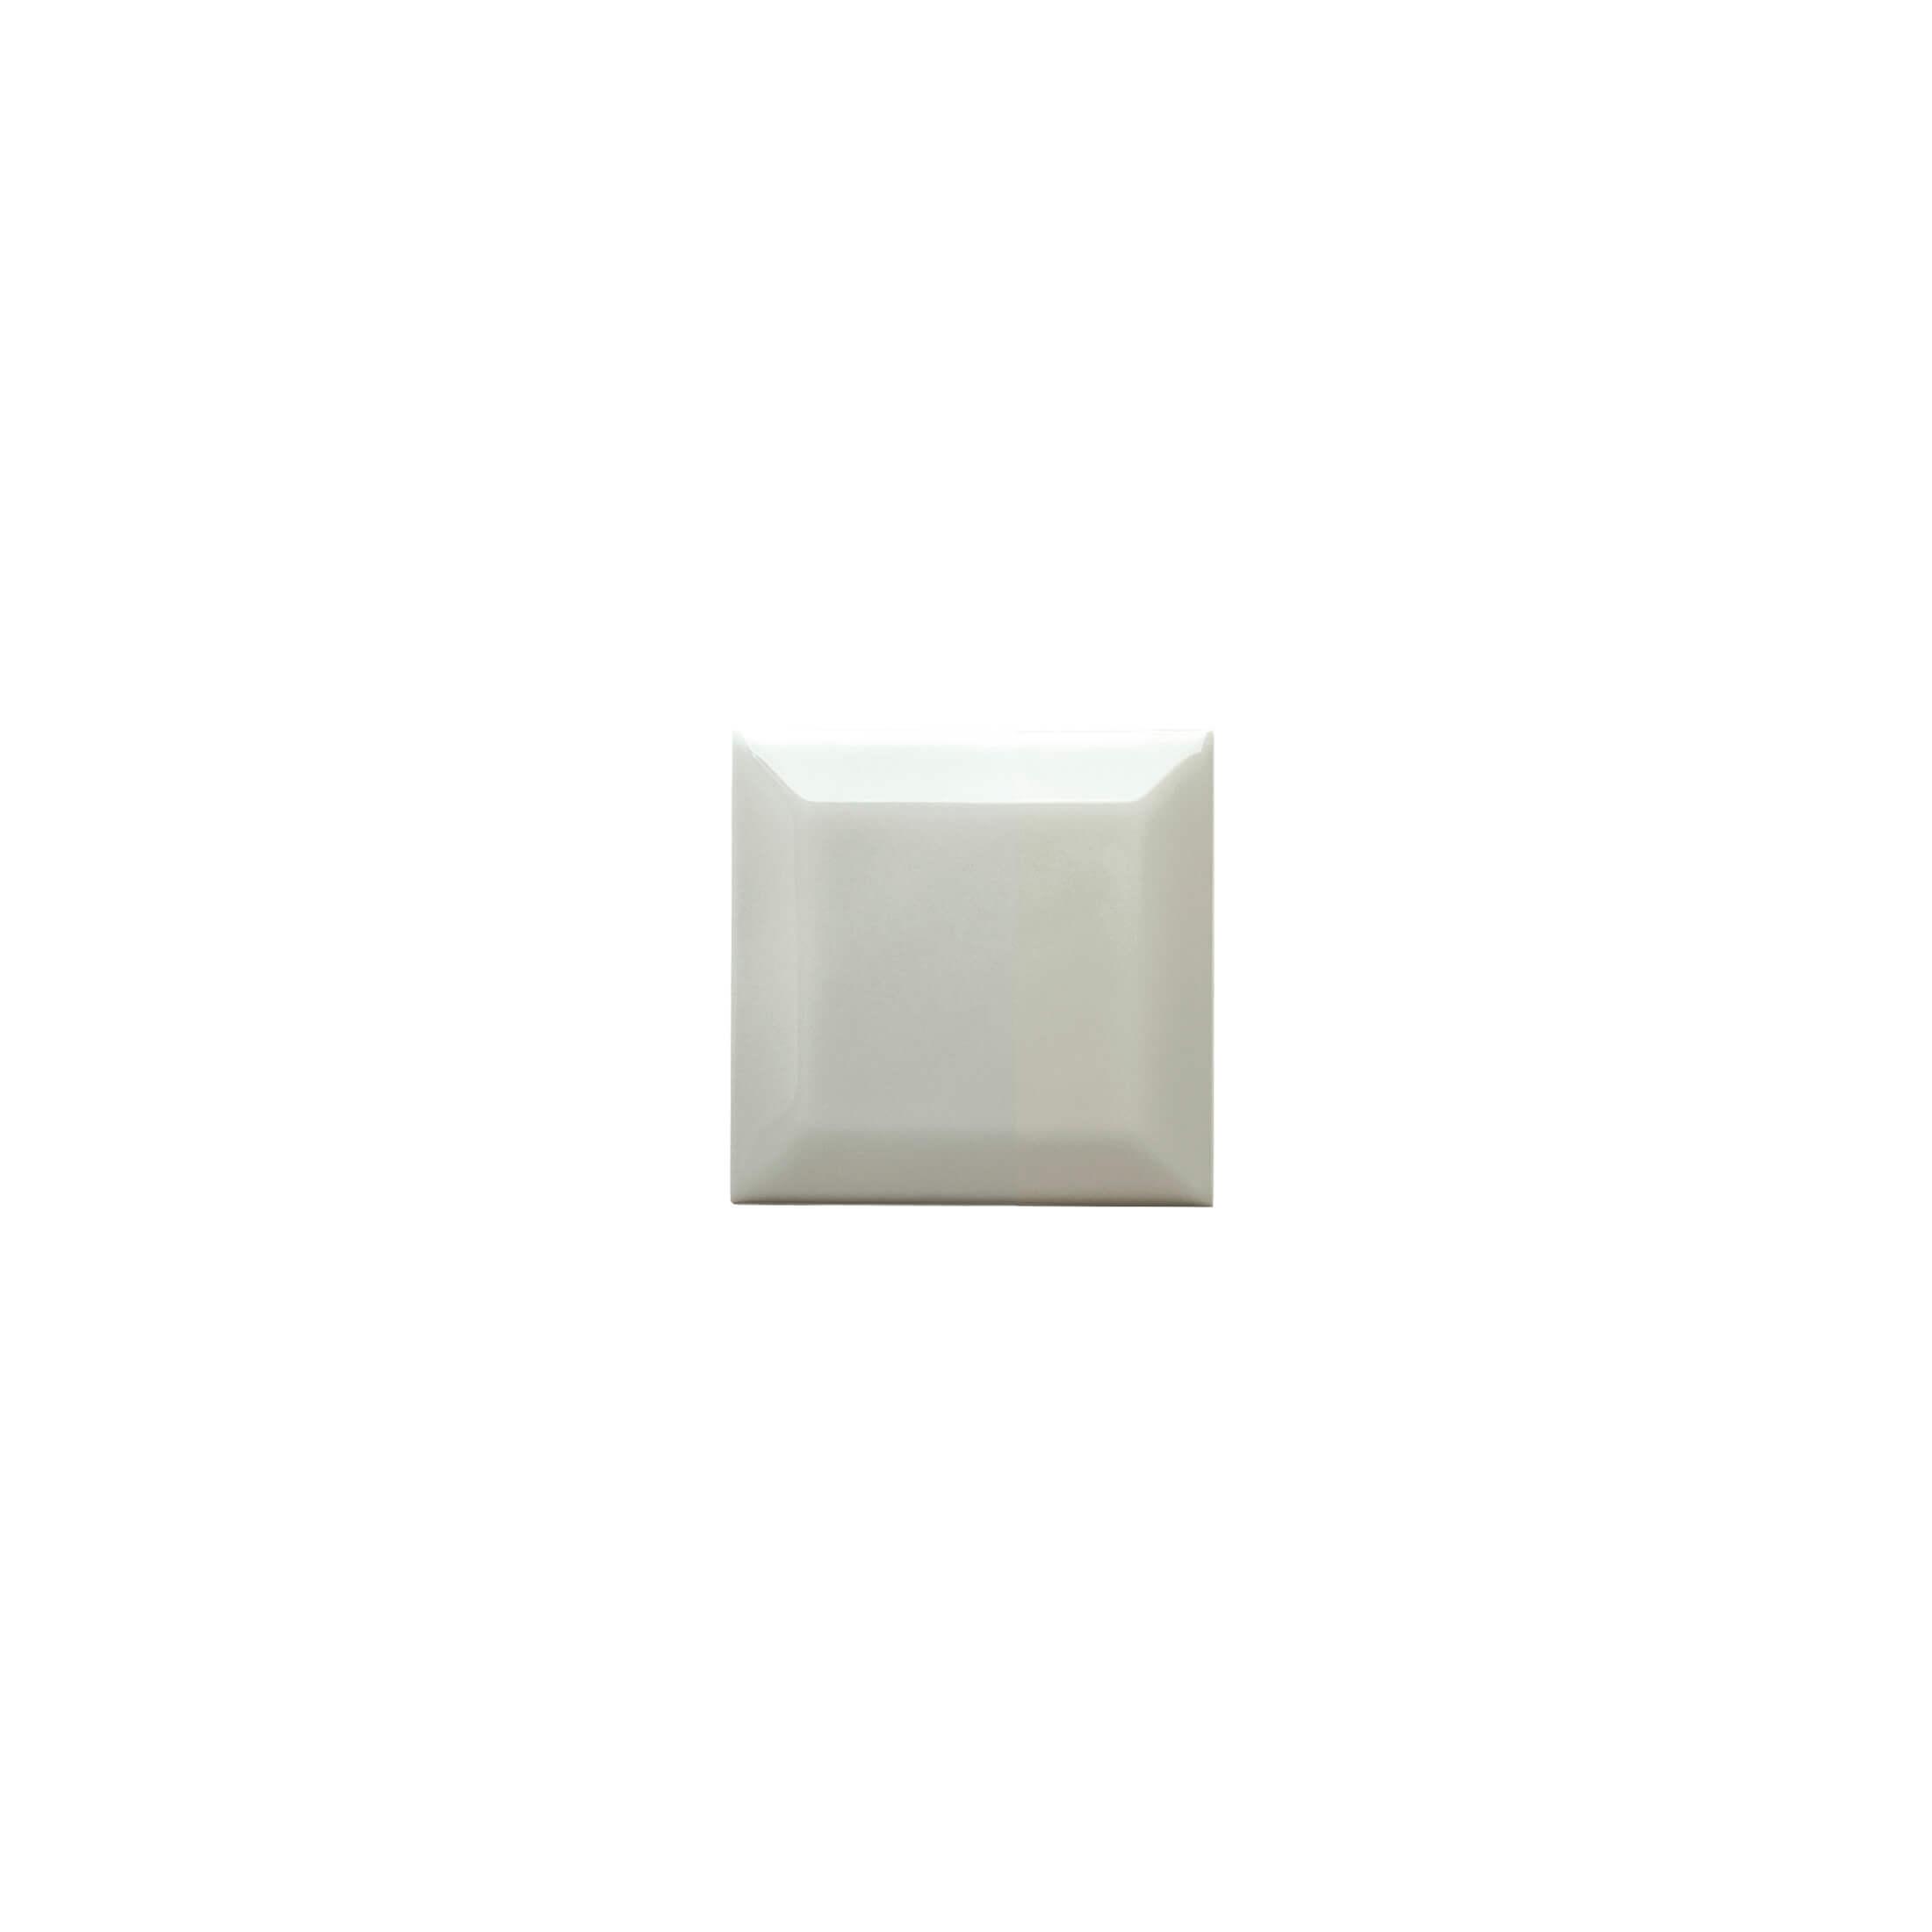 ADNE5568 - BISELADO PB - 7.5 cm X 7.5 cm